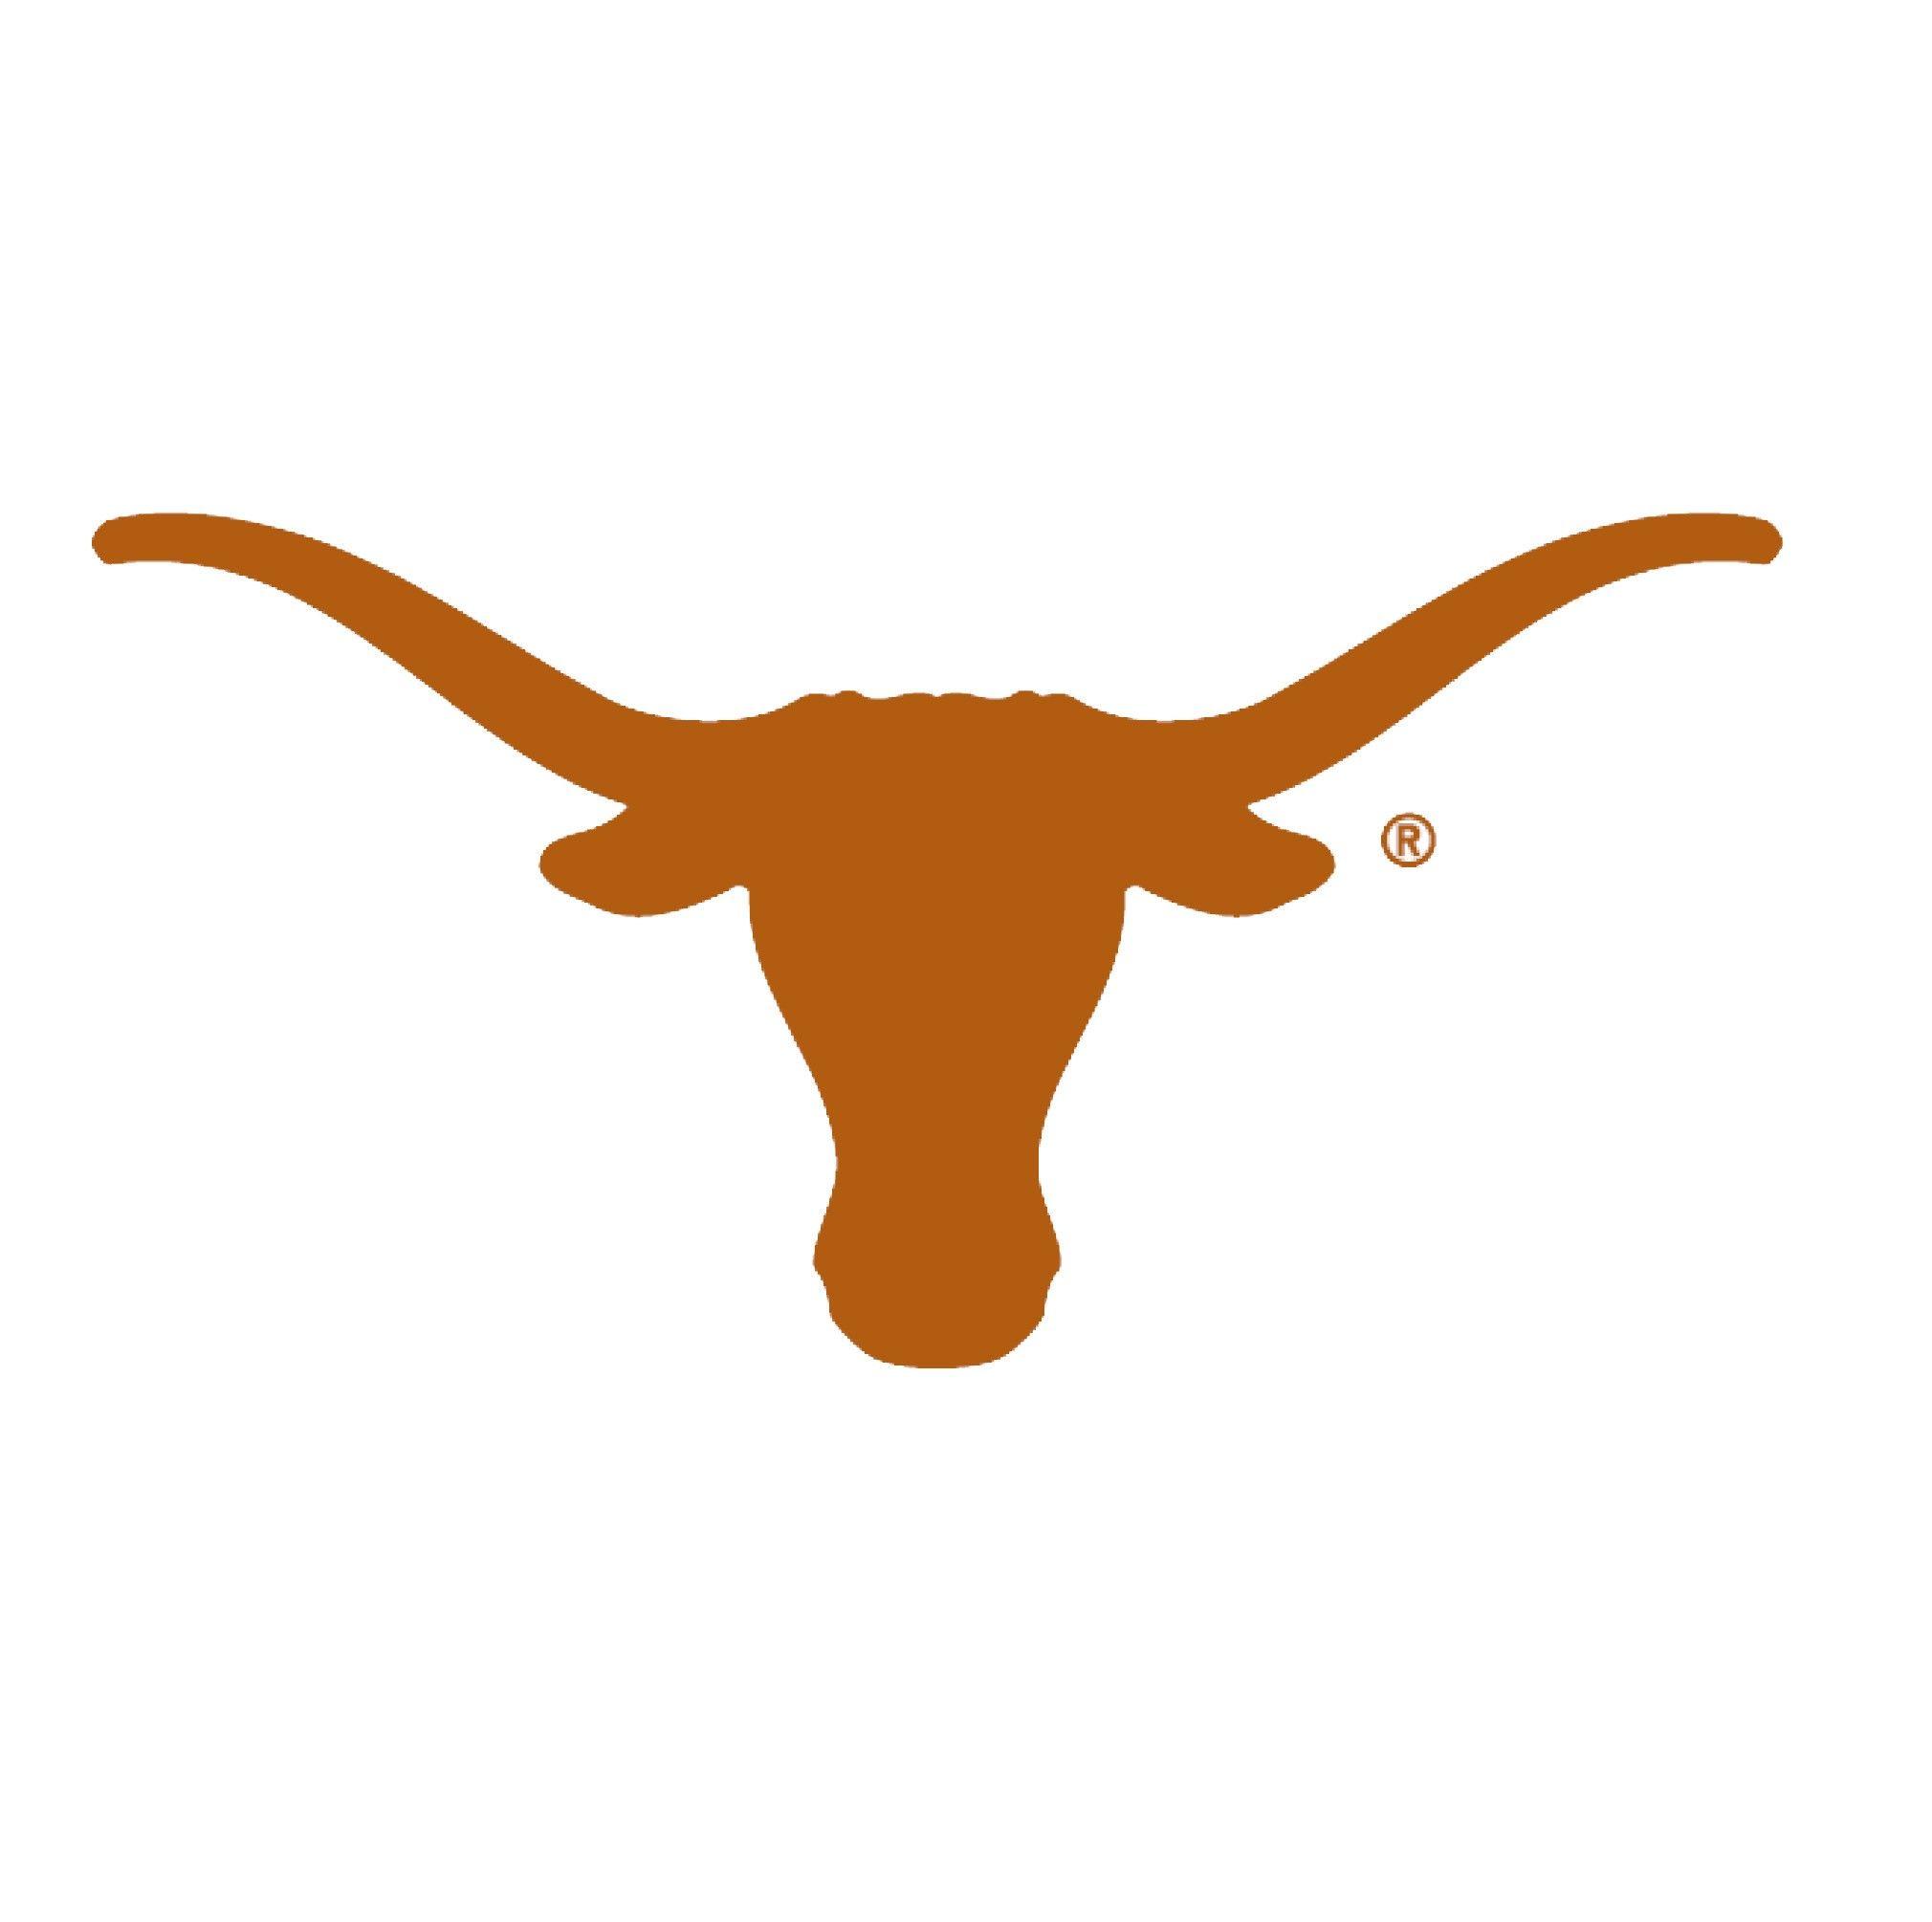 Luxury Texas Longhorns Wallpaper Check More At Https Zdwebhosting Com Texas Longhorns Wallpaper 2 Di 2020